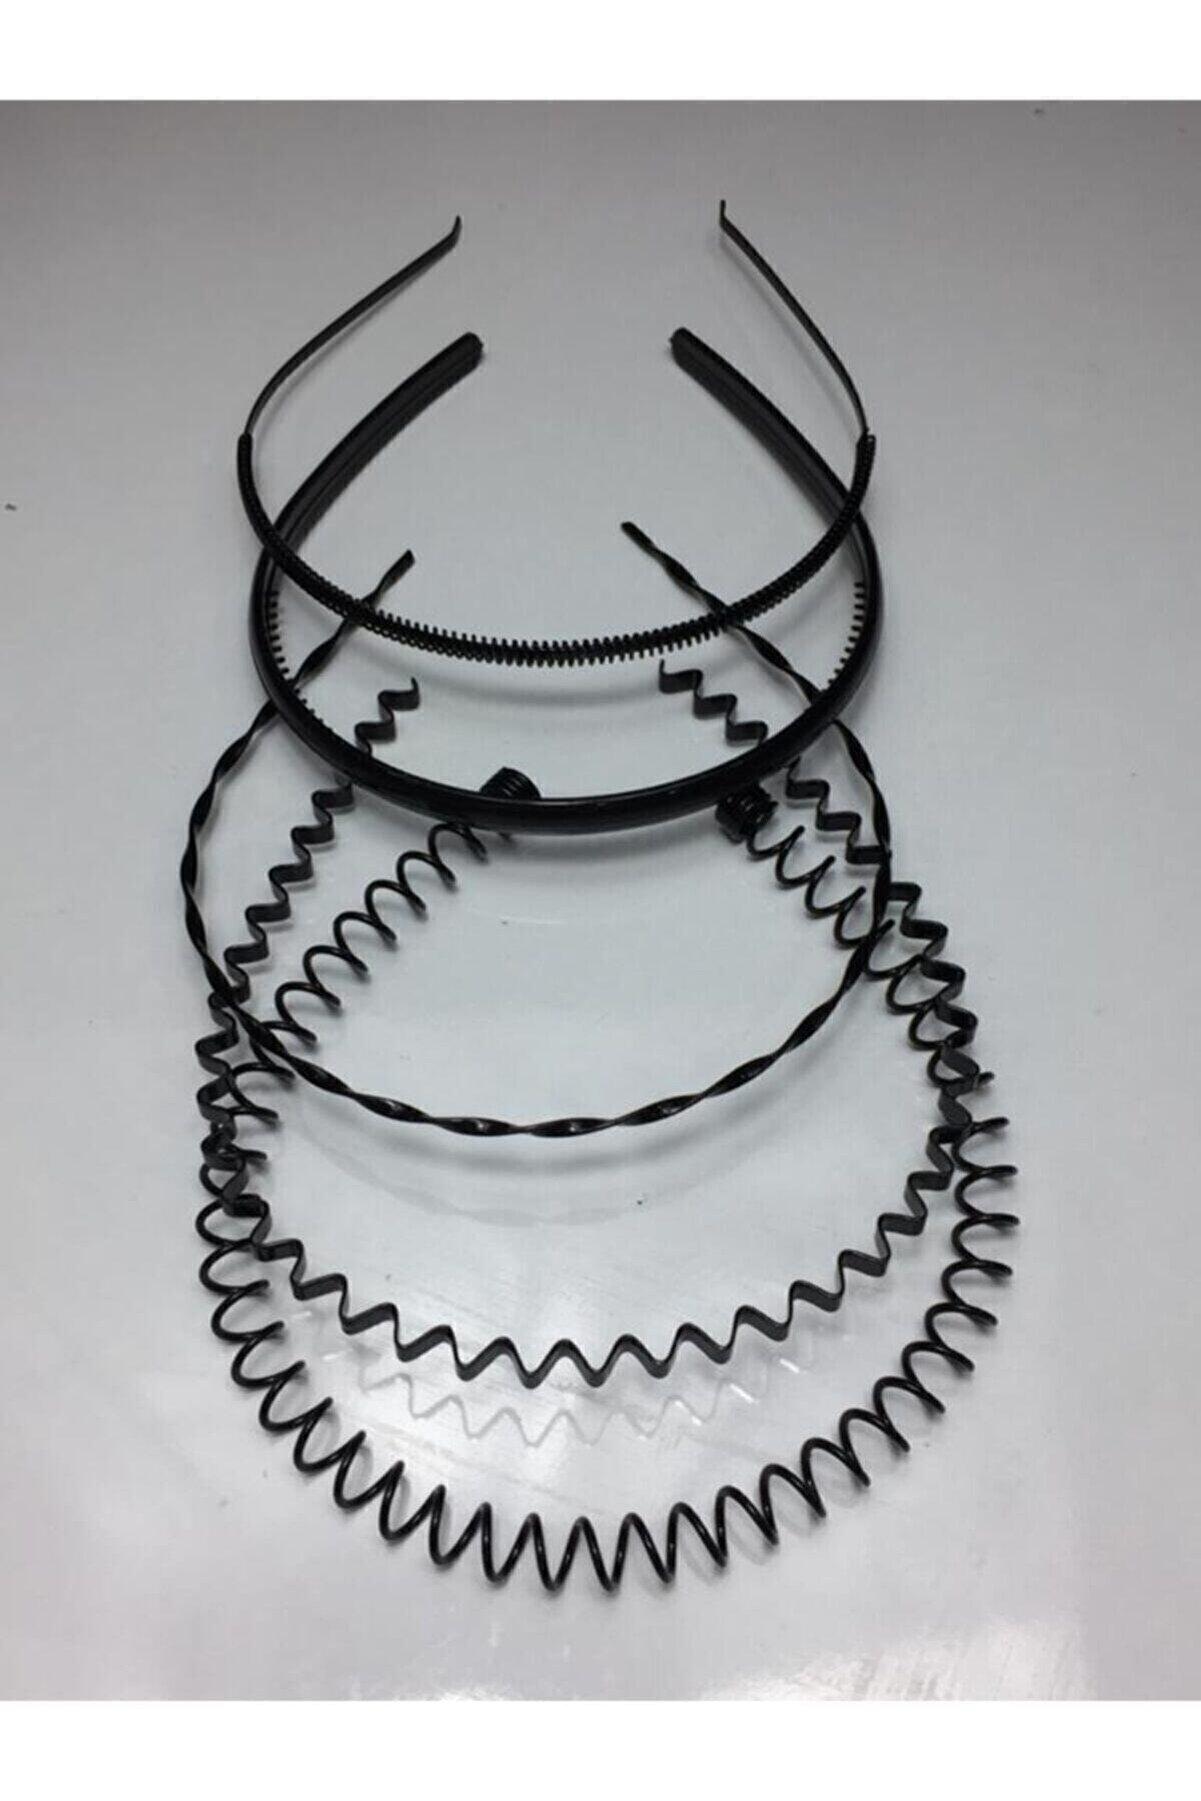 Durubags Siyah Metal Taç Erkek Kadın Sporcu Saç Tacı 5 Parçalı Set-1